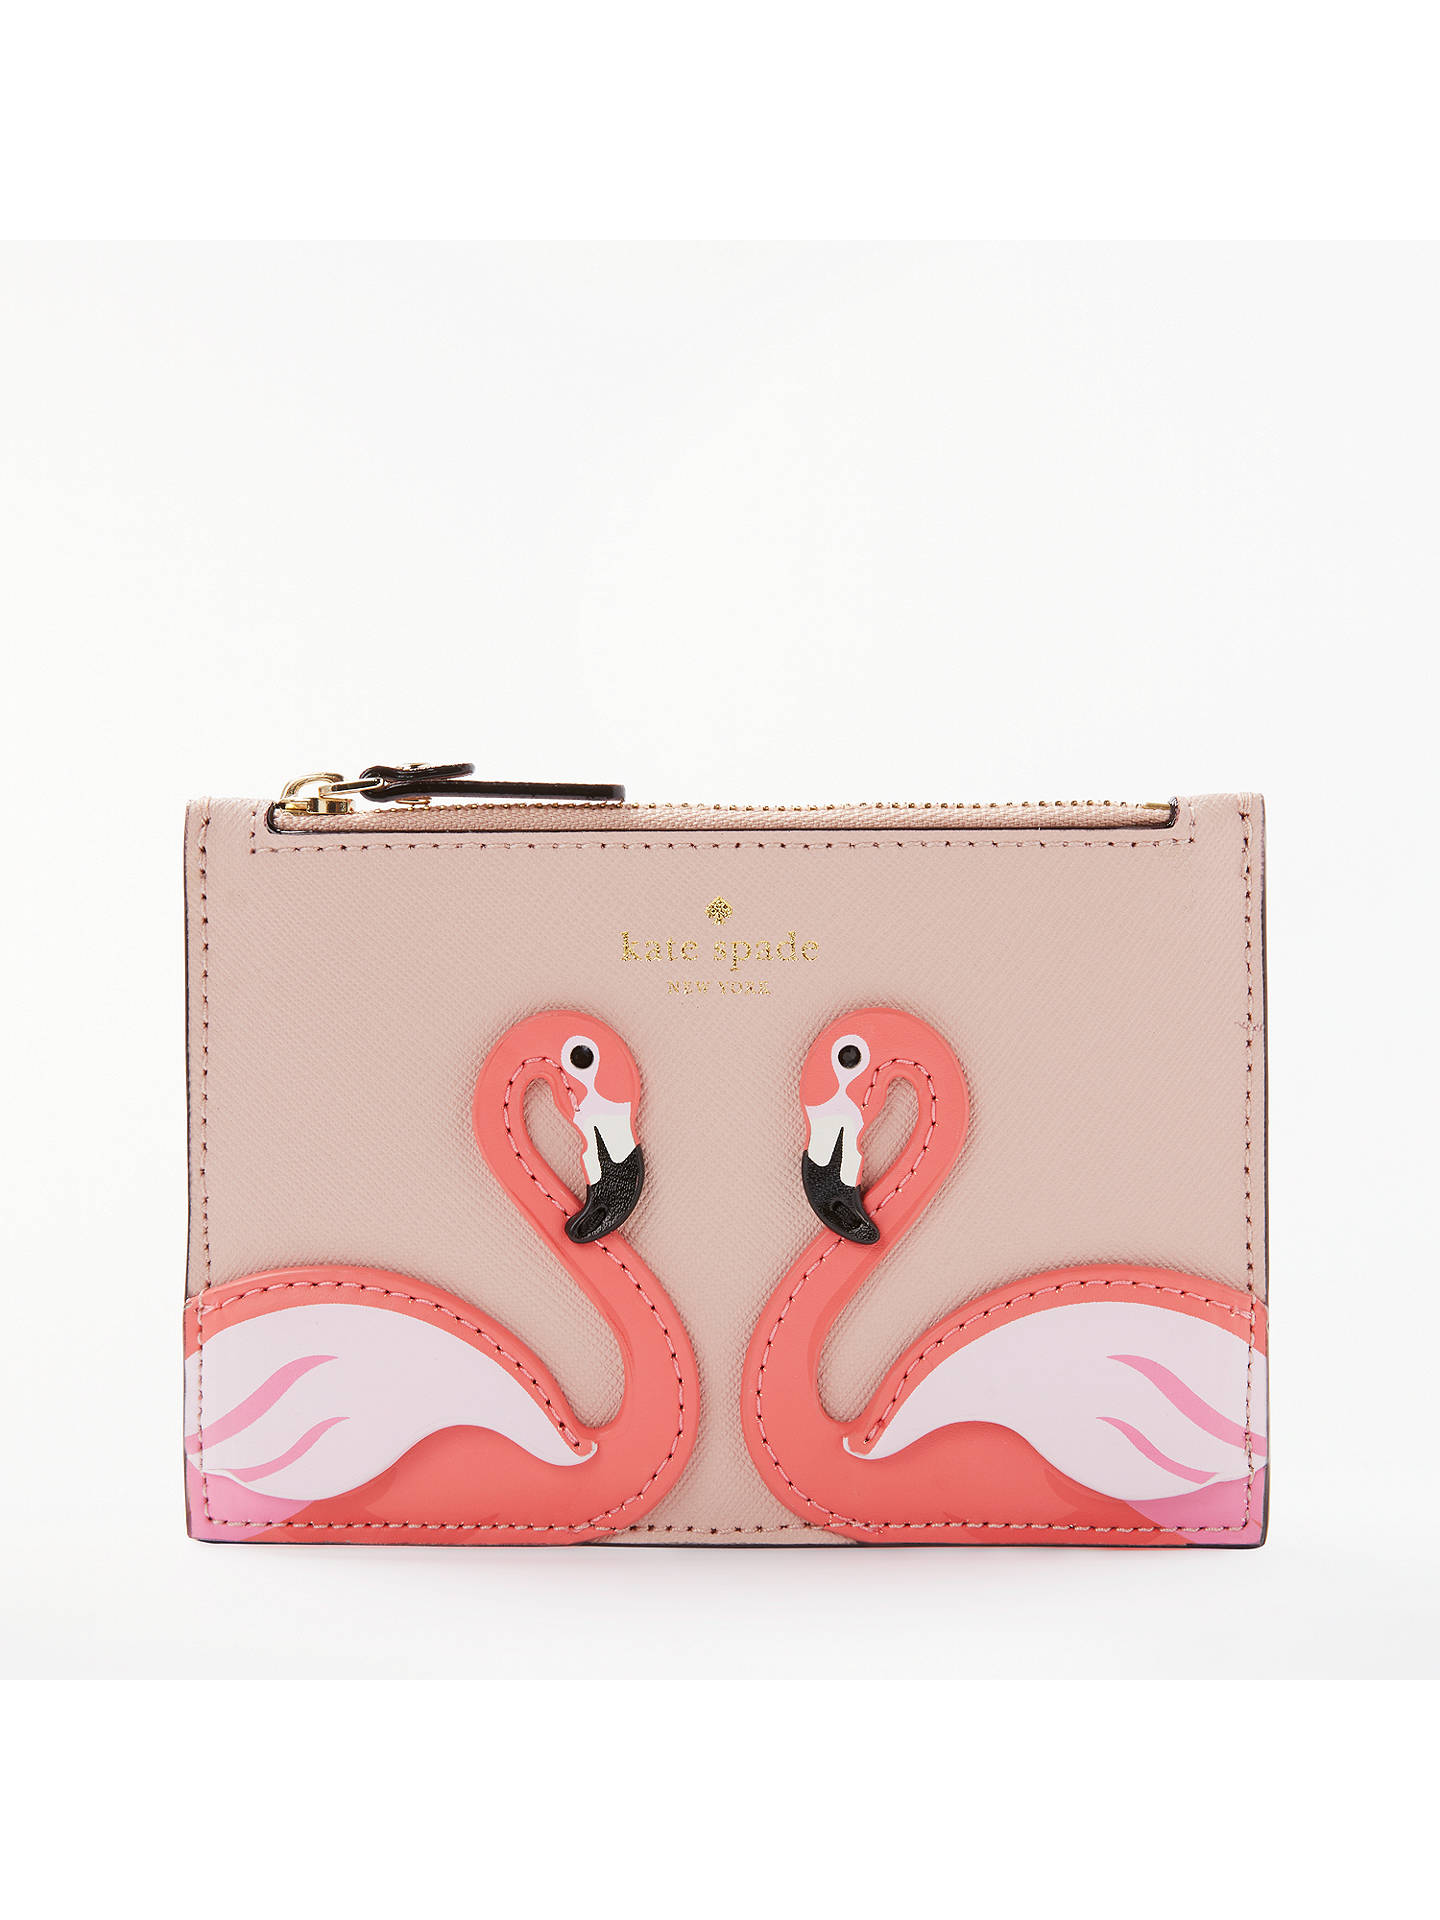 Womens Wallets Two Birds Under The Setting Sun Leather Passport Wallet Coin Purse Girls Handbags